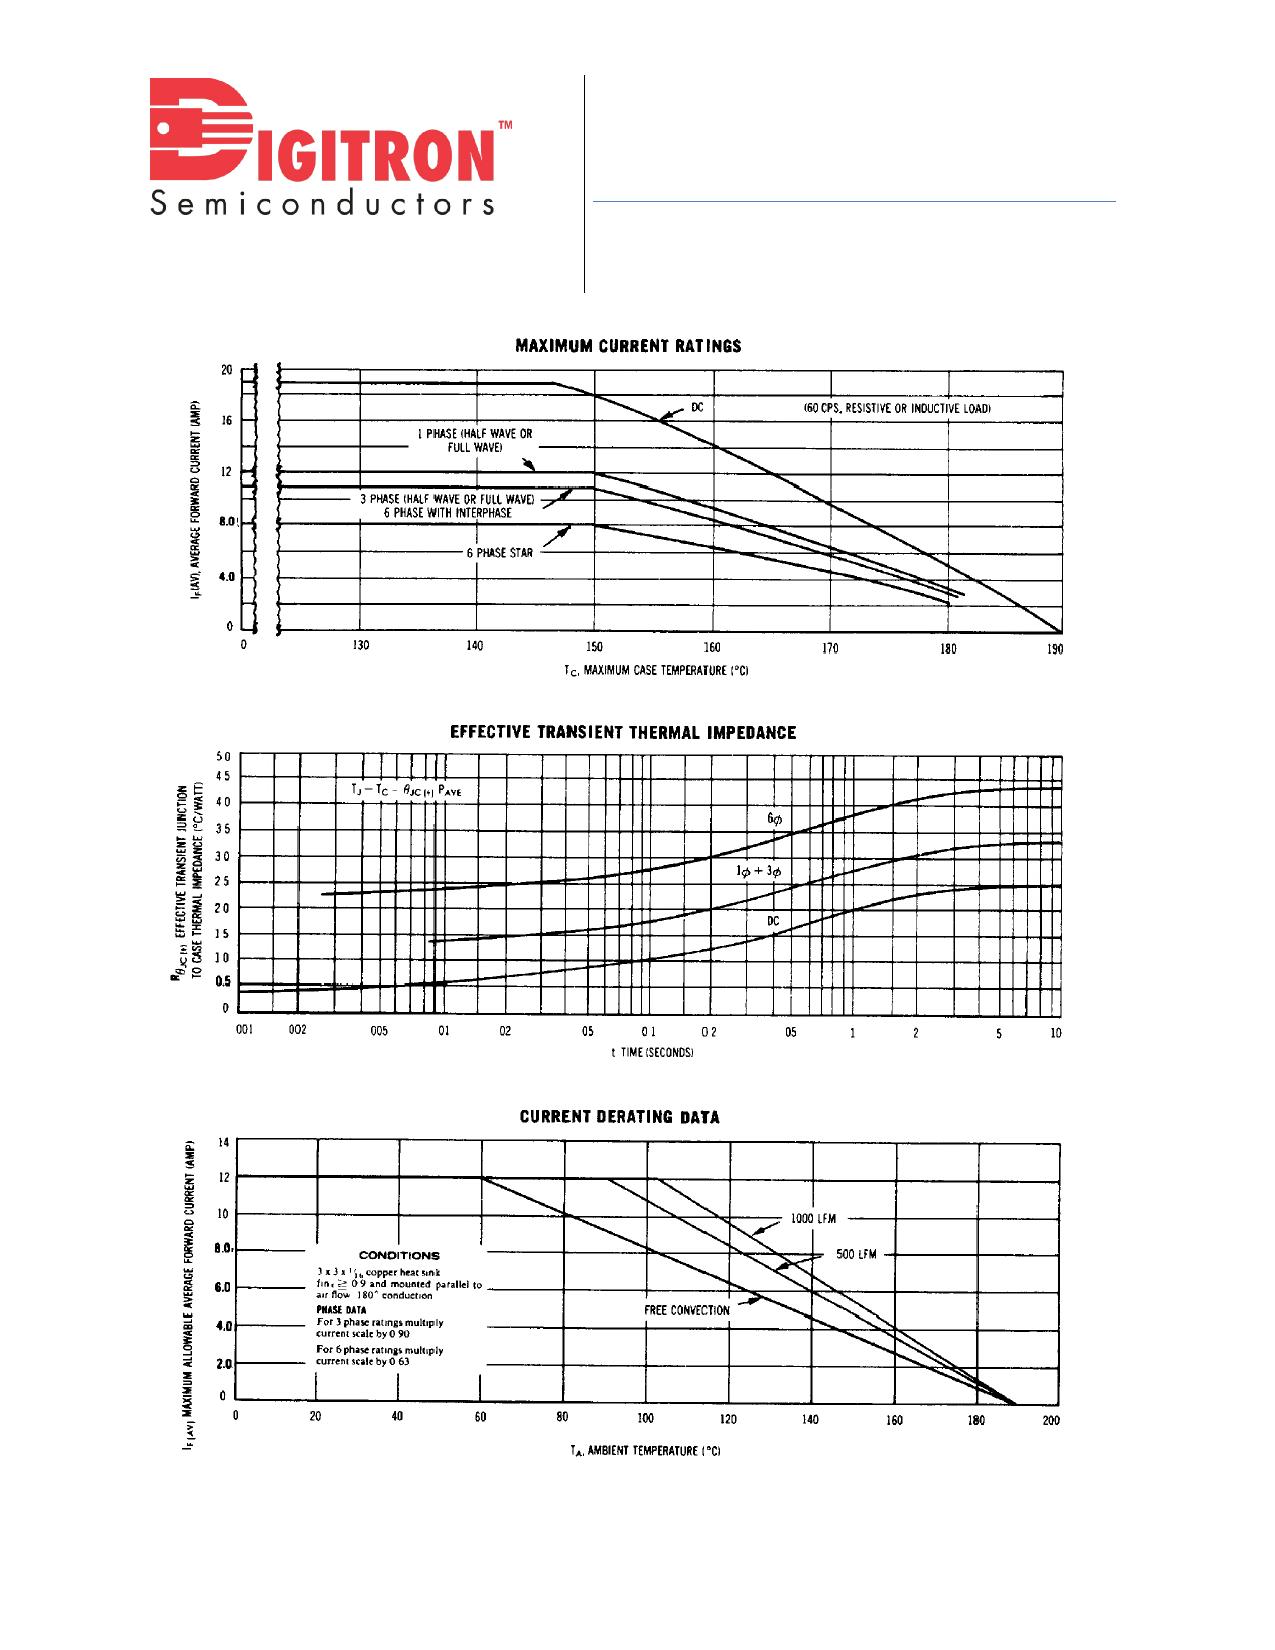 MR1128 pdf, 반도체, 판매, 대치품